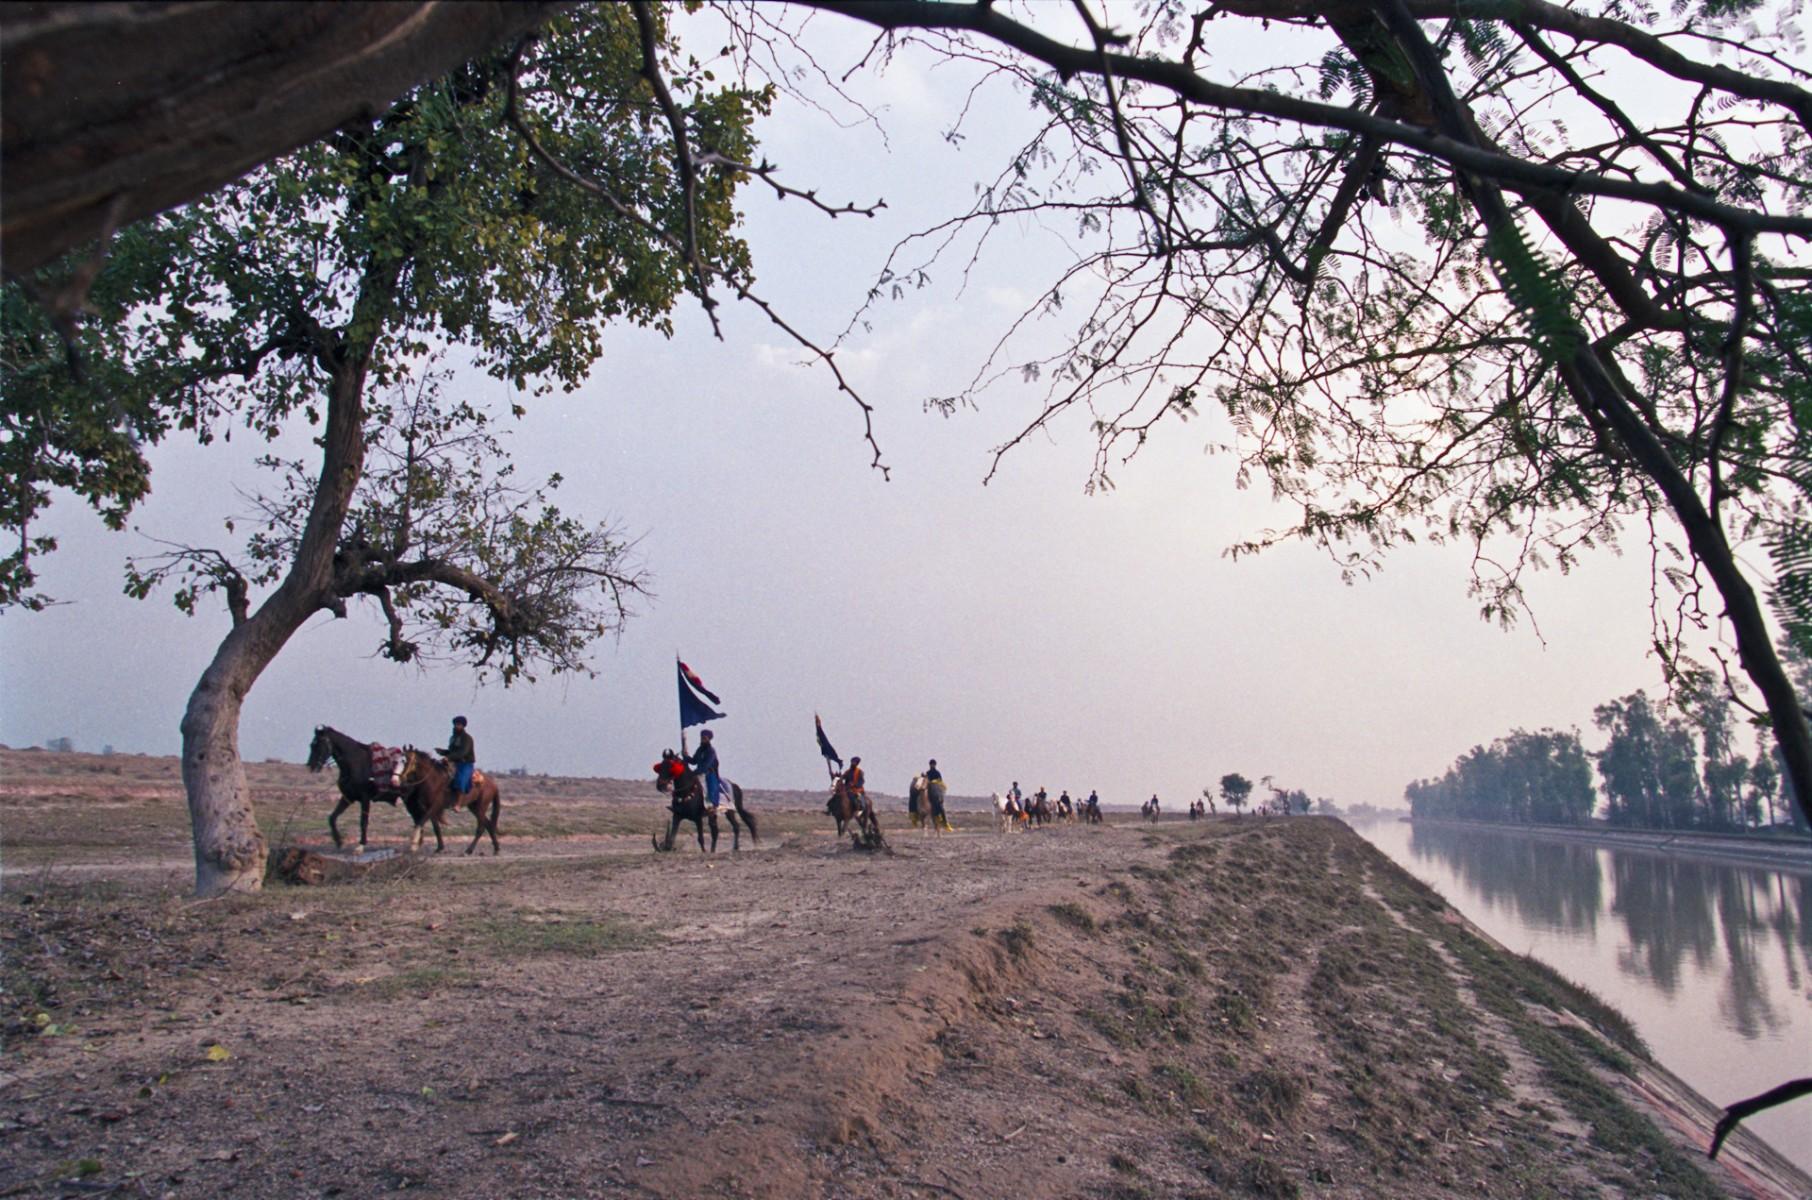 Nihangs by canal near Mudki